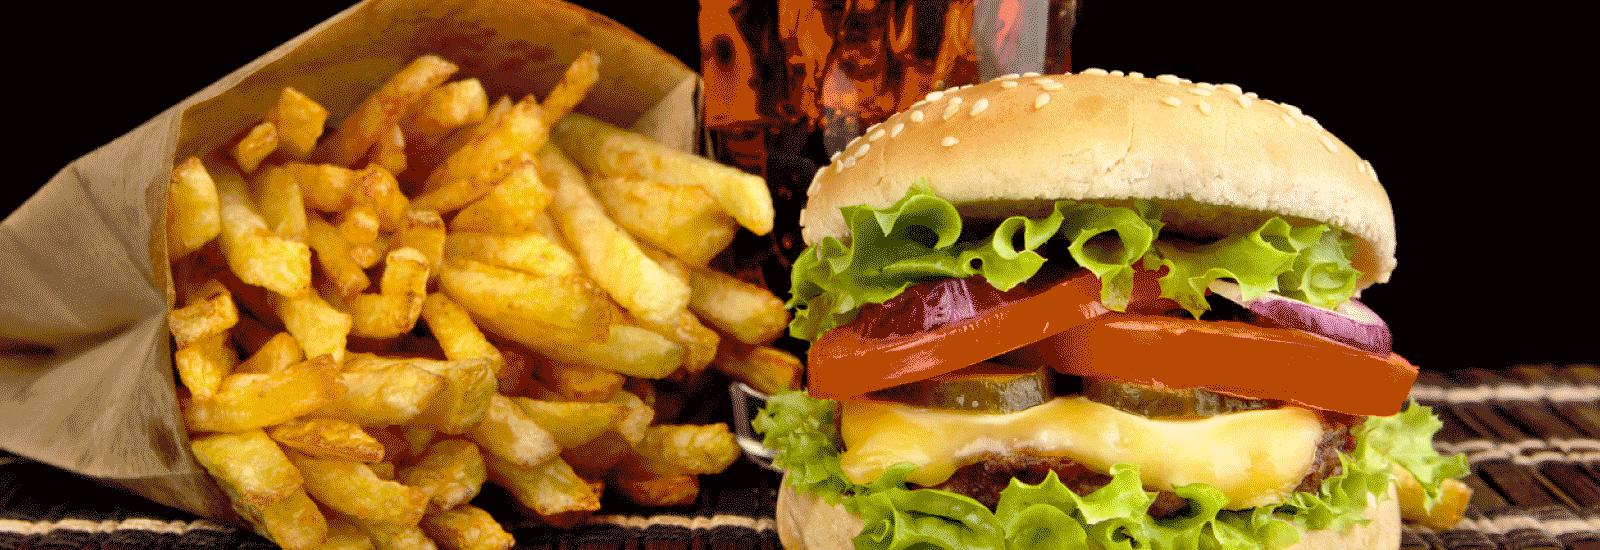 Offutt AFB Fast Food Restaurants